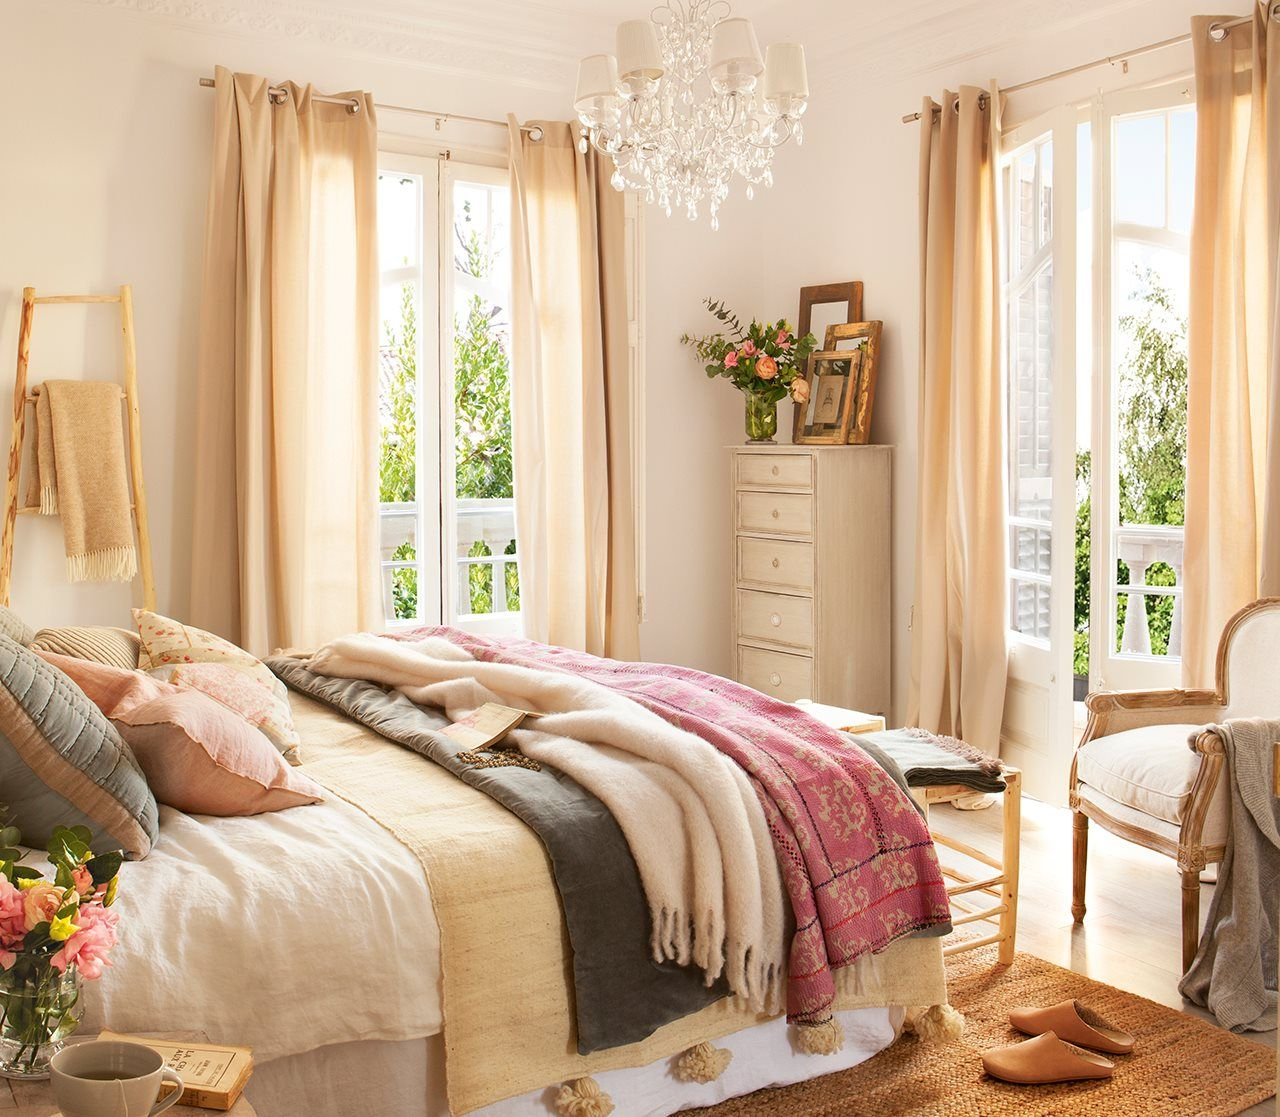 Trucos para conseguir un dormitorio de revista dise o for Revistas decoracion dormitorios